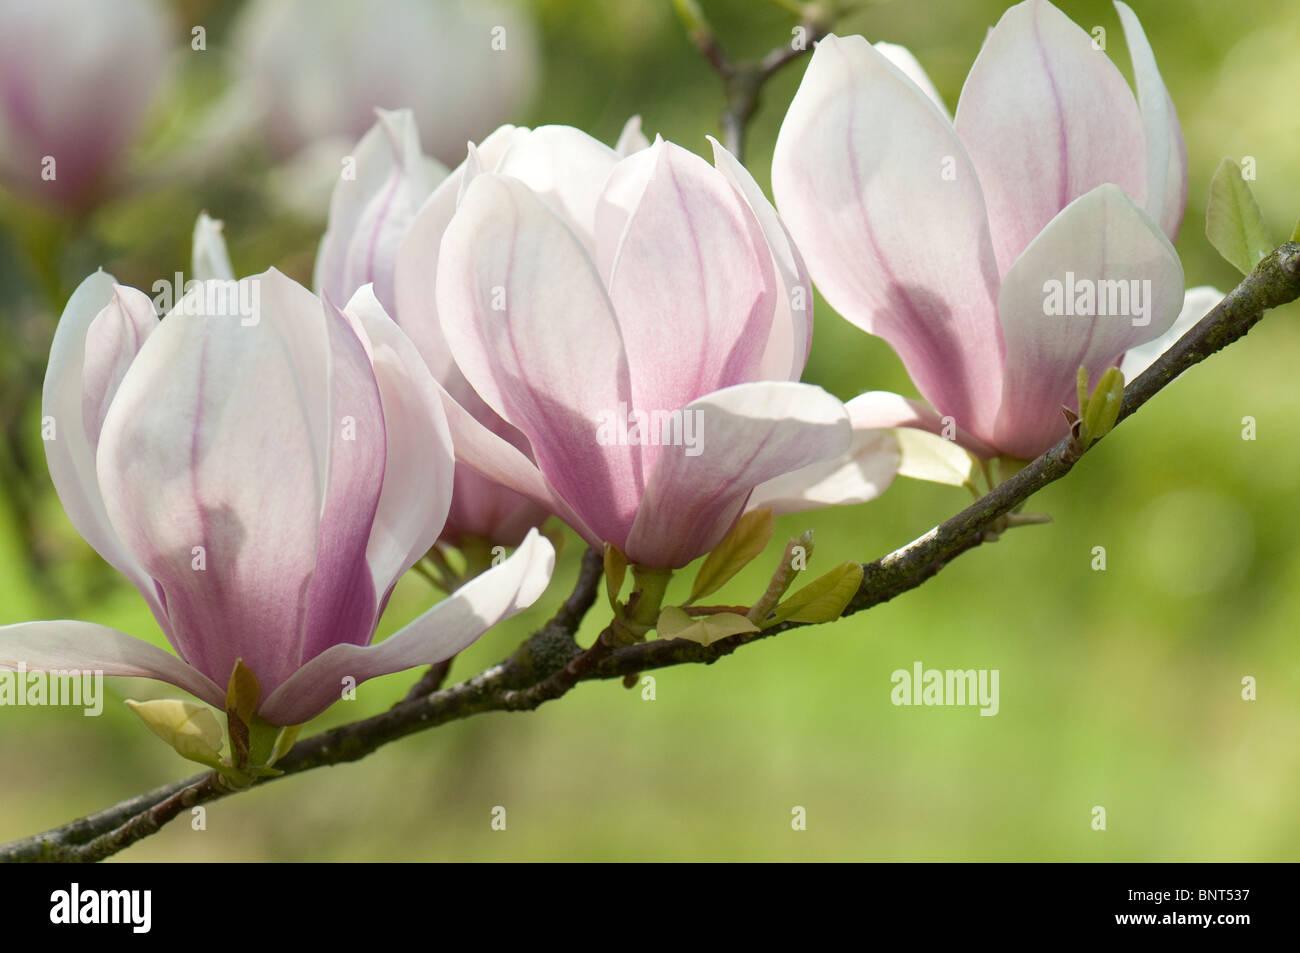 Saucer Magnolia (Magnolia x soulangeana), variety: Norbertiana, flowering twig. Stock Photo